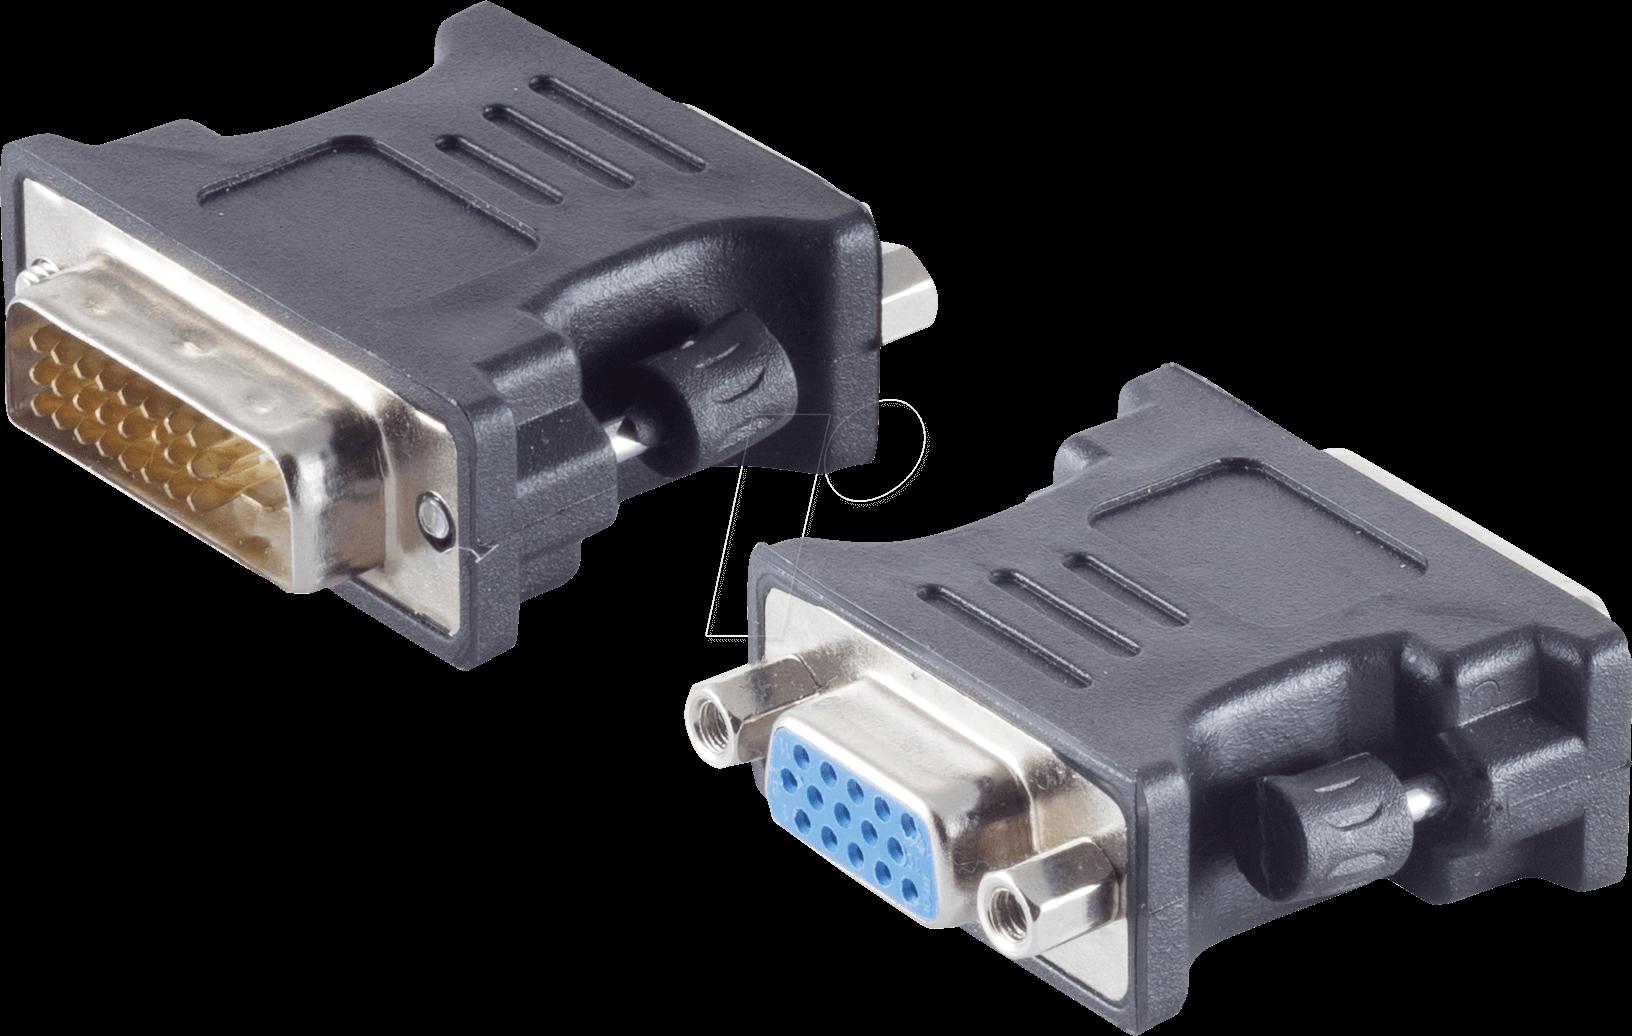 Shvp Bs77416 2 Adapter Dvi D Plug 24 1 Dual Link Vga Bush At Reichelt Elektronik